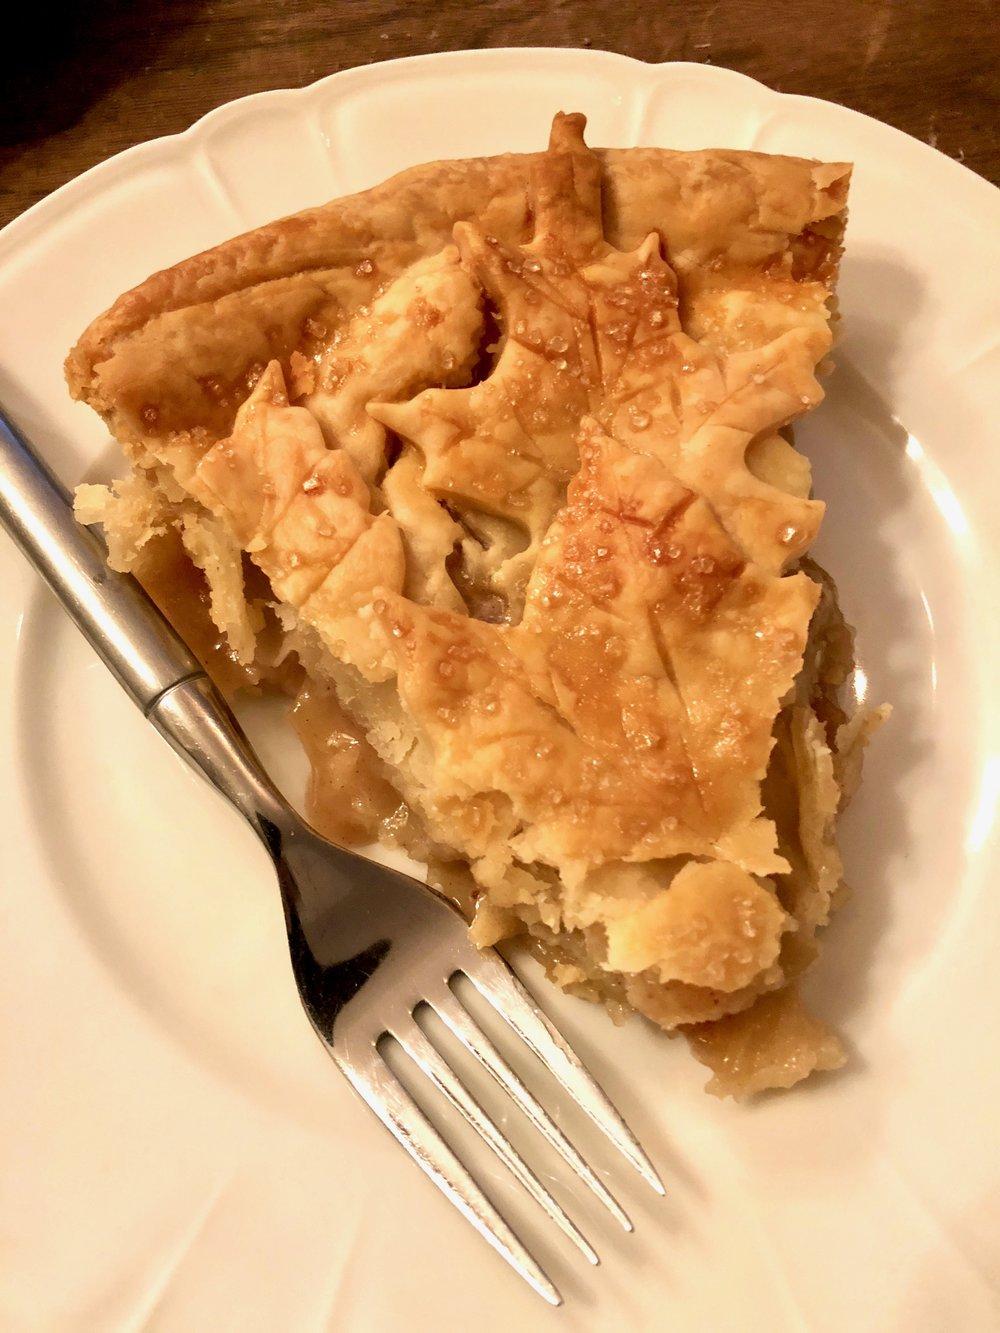 A slice of warm apple pie